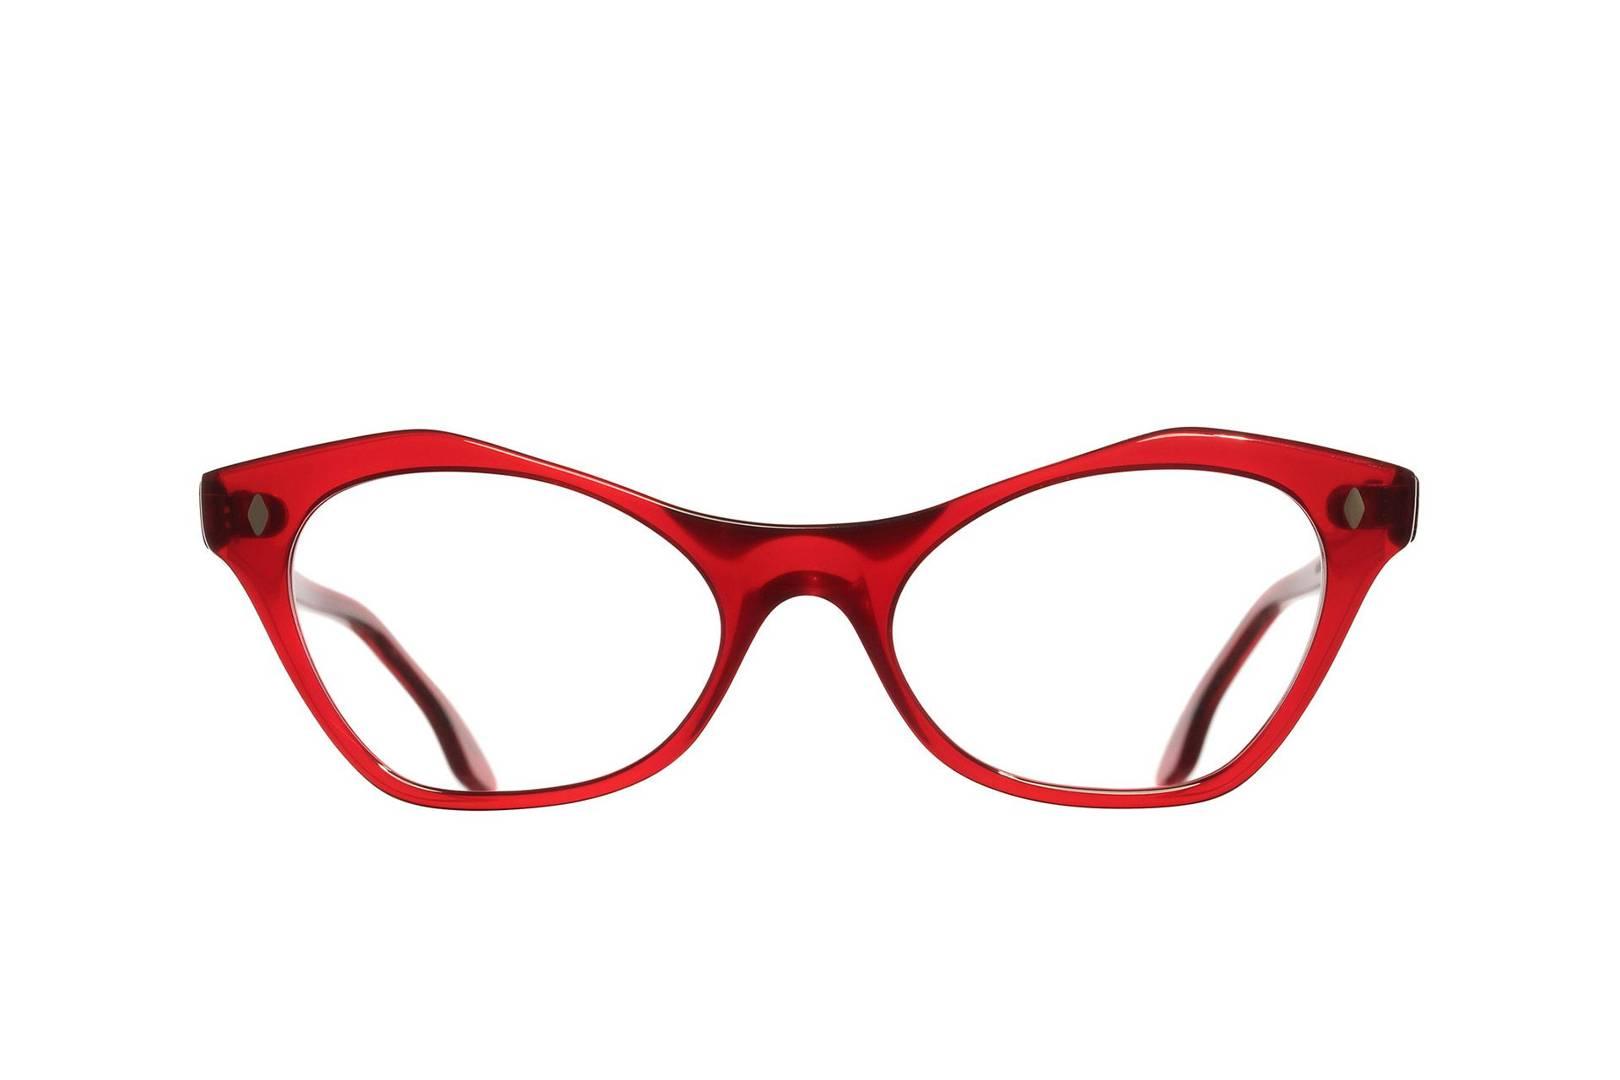 b540b1c1c9 Best Designer Glasses 2017  Stylish Glasses To Shop Now